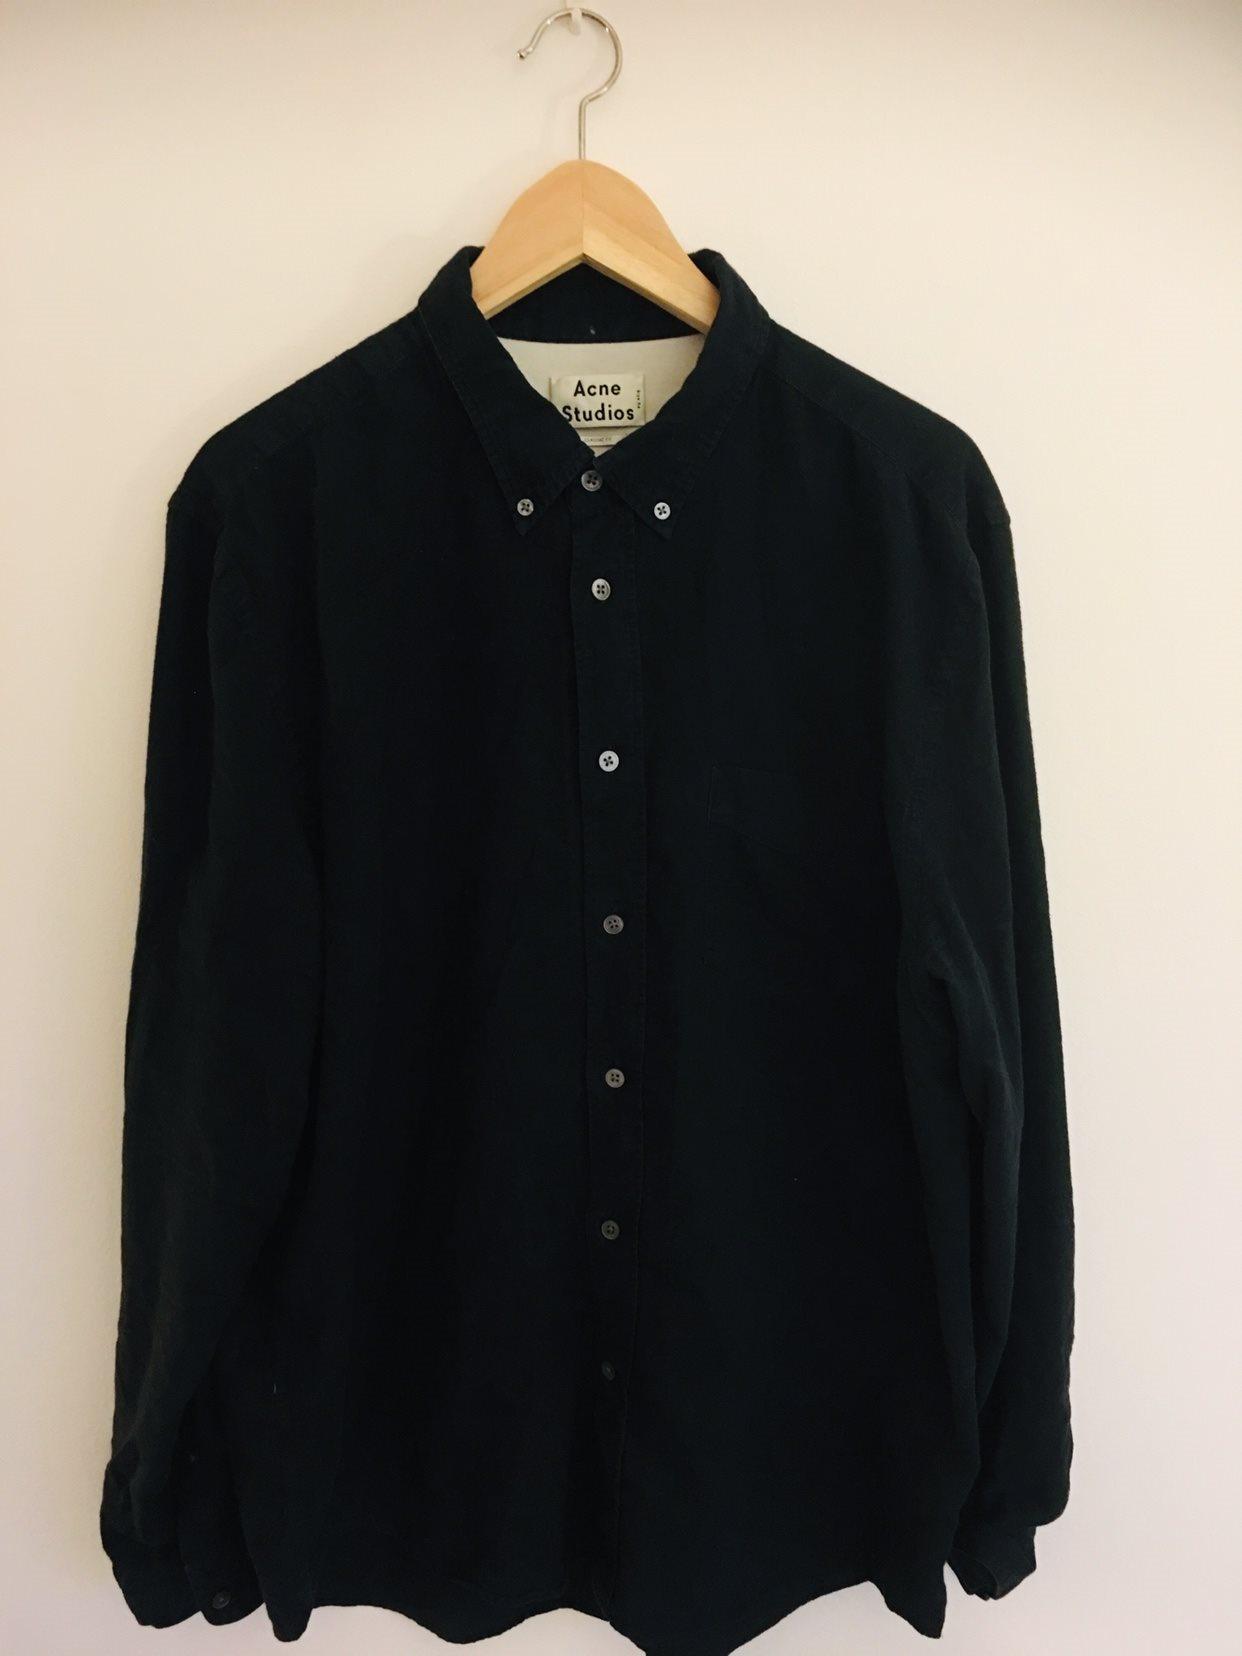 ACNE STUDIOS - svart skjorta - strl 54/XL